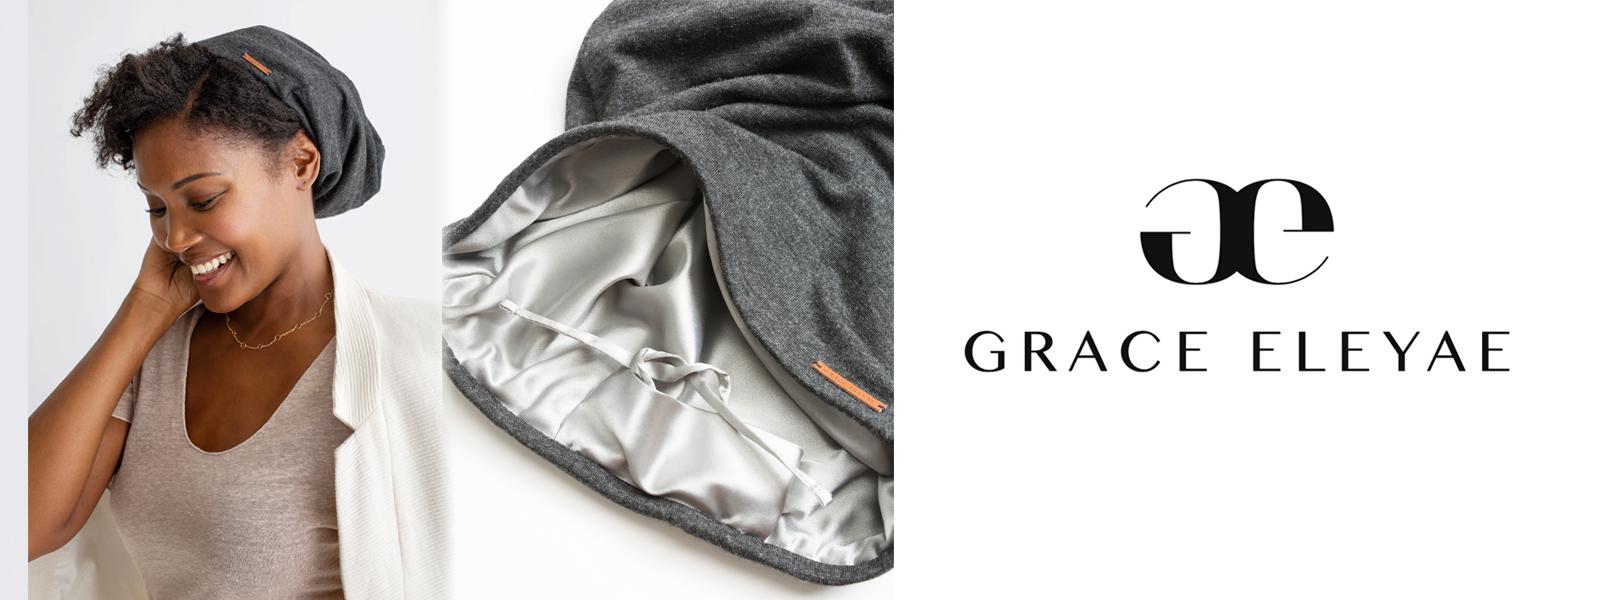 grace_eleyae_banner